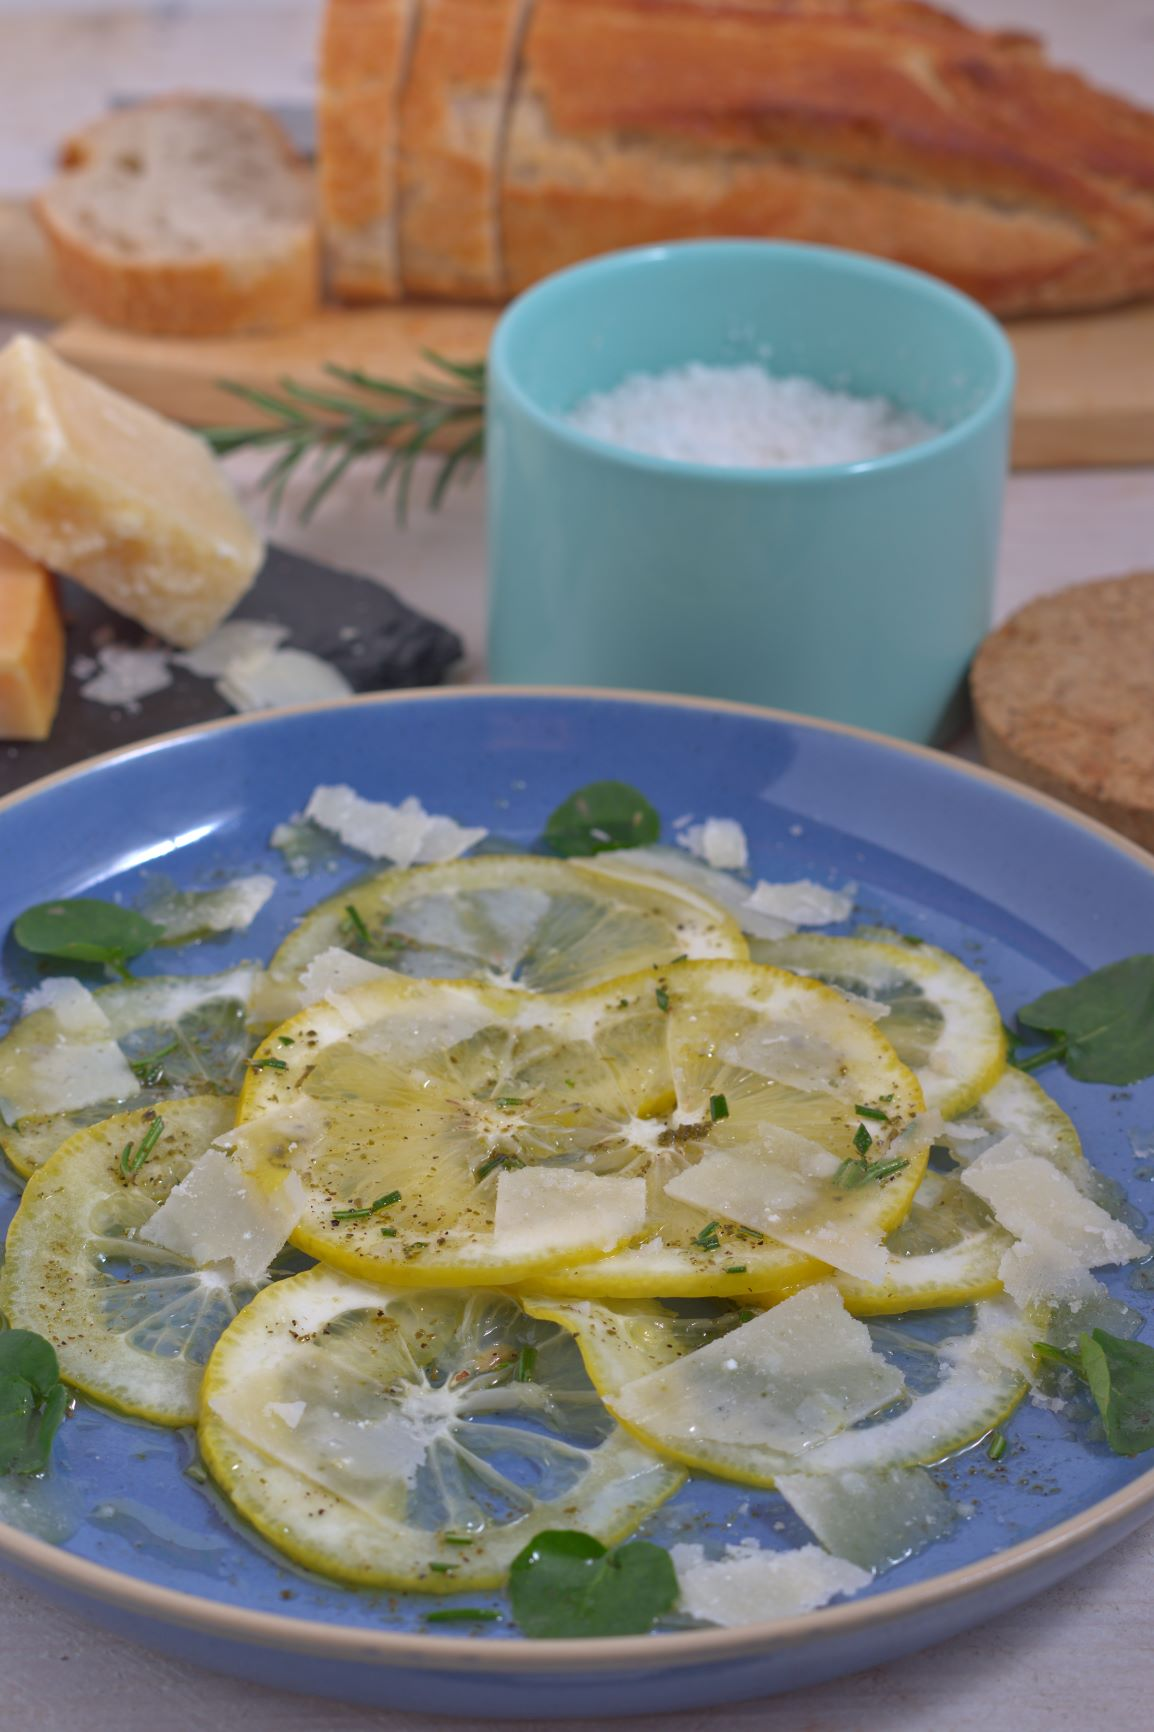 Zitronencarpaccio mit sizilianischen Zitronen